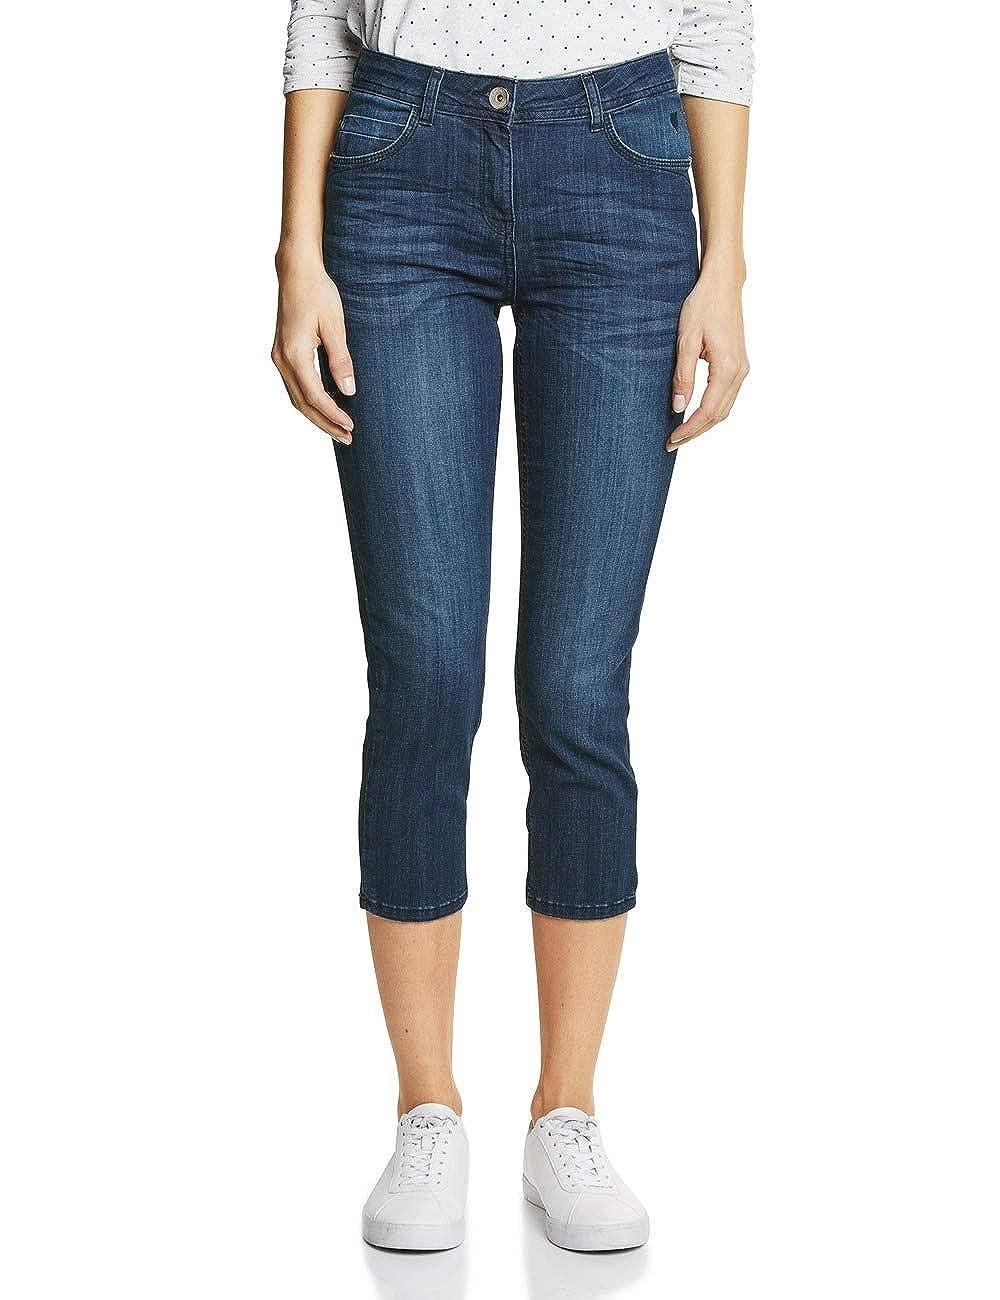 bluee (Mid bluee Wash 10284) Cecil Women's Slim Jeans